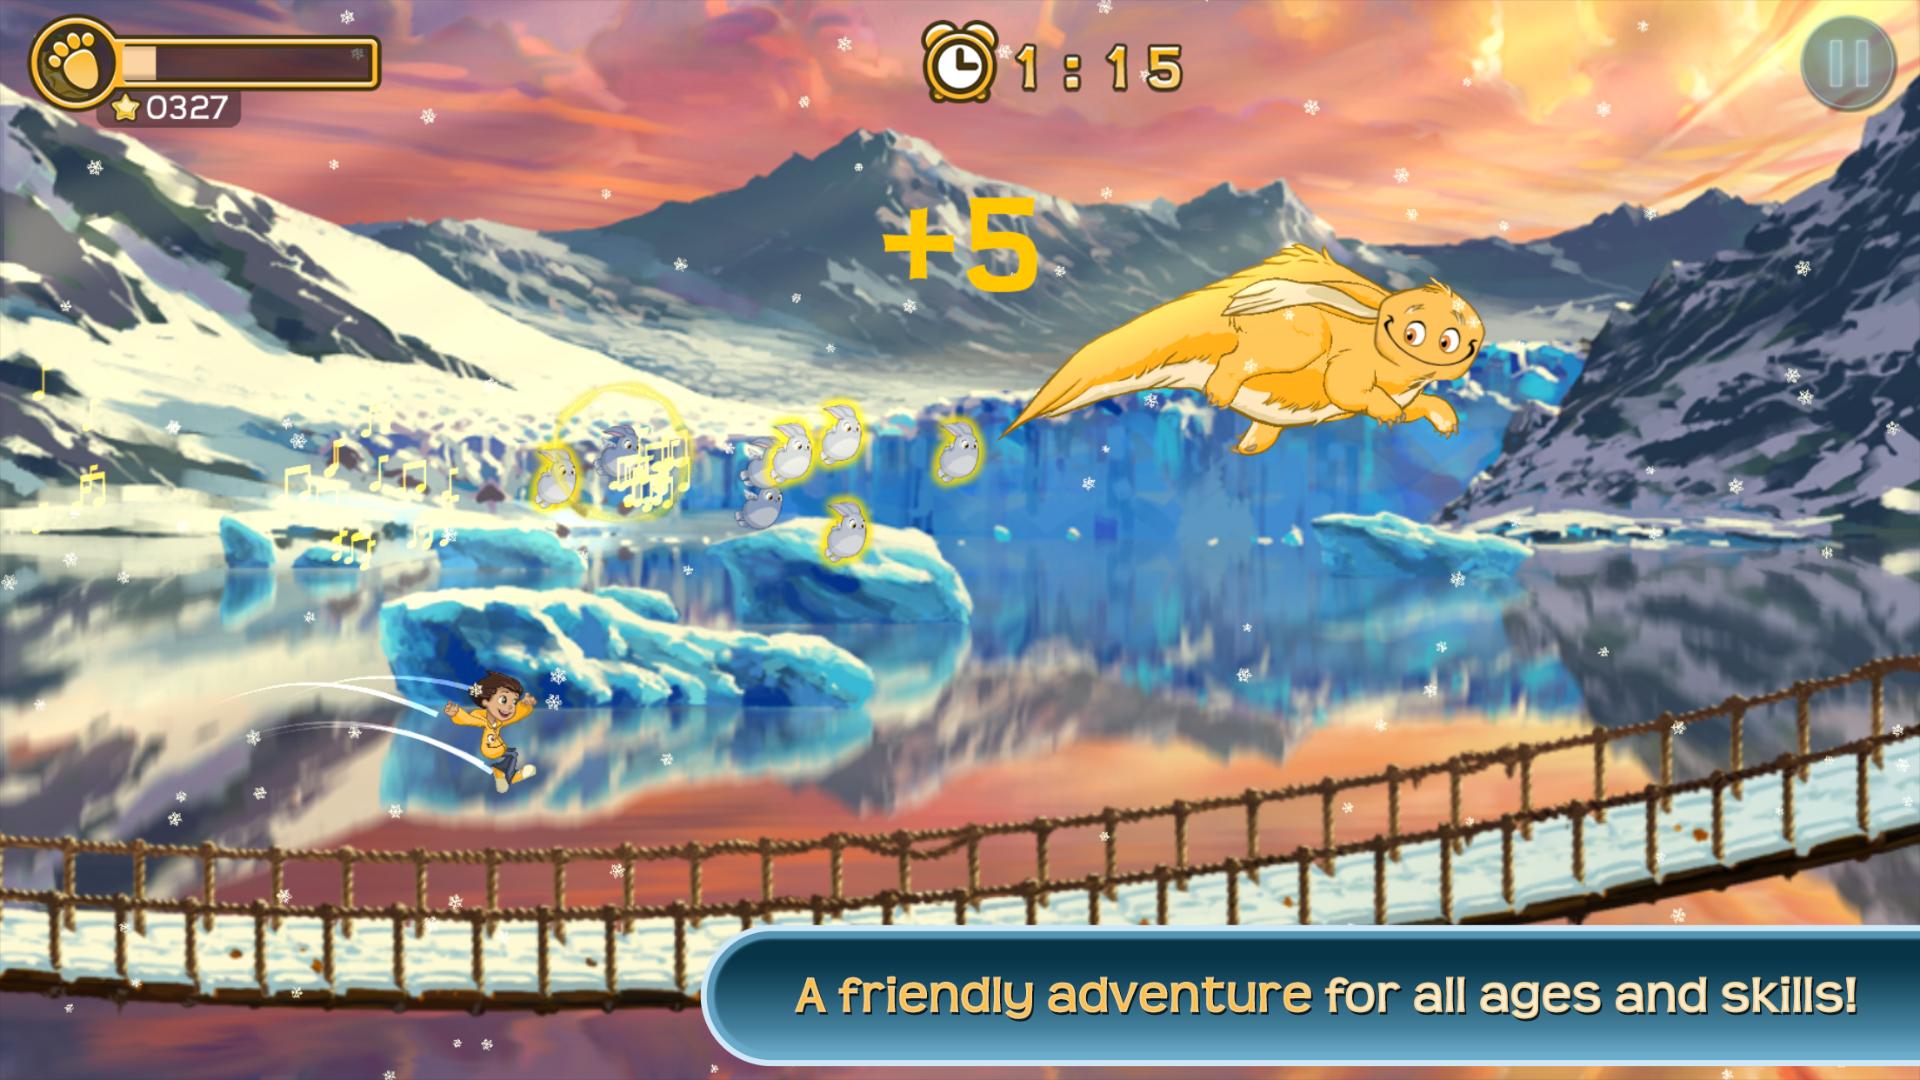 Screenshot 12 of 15